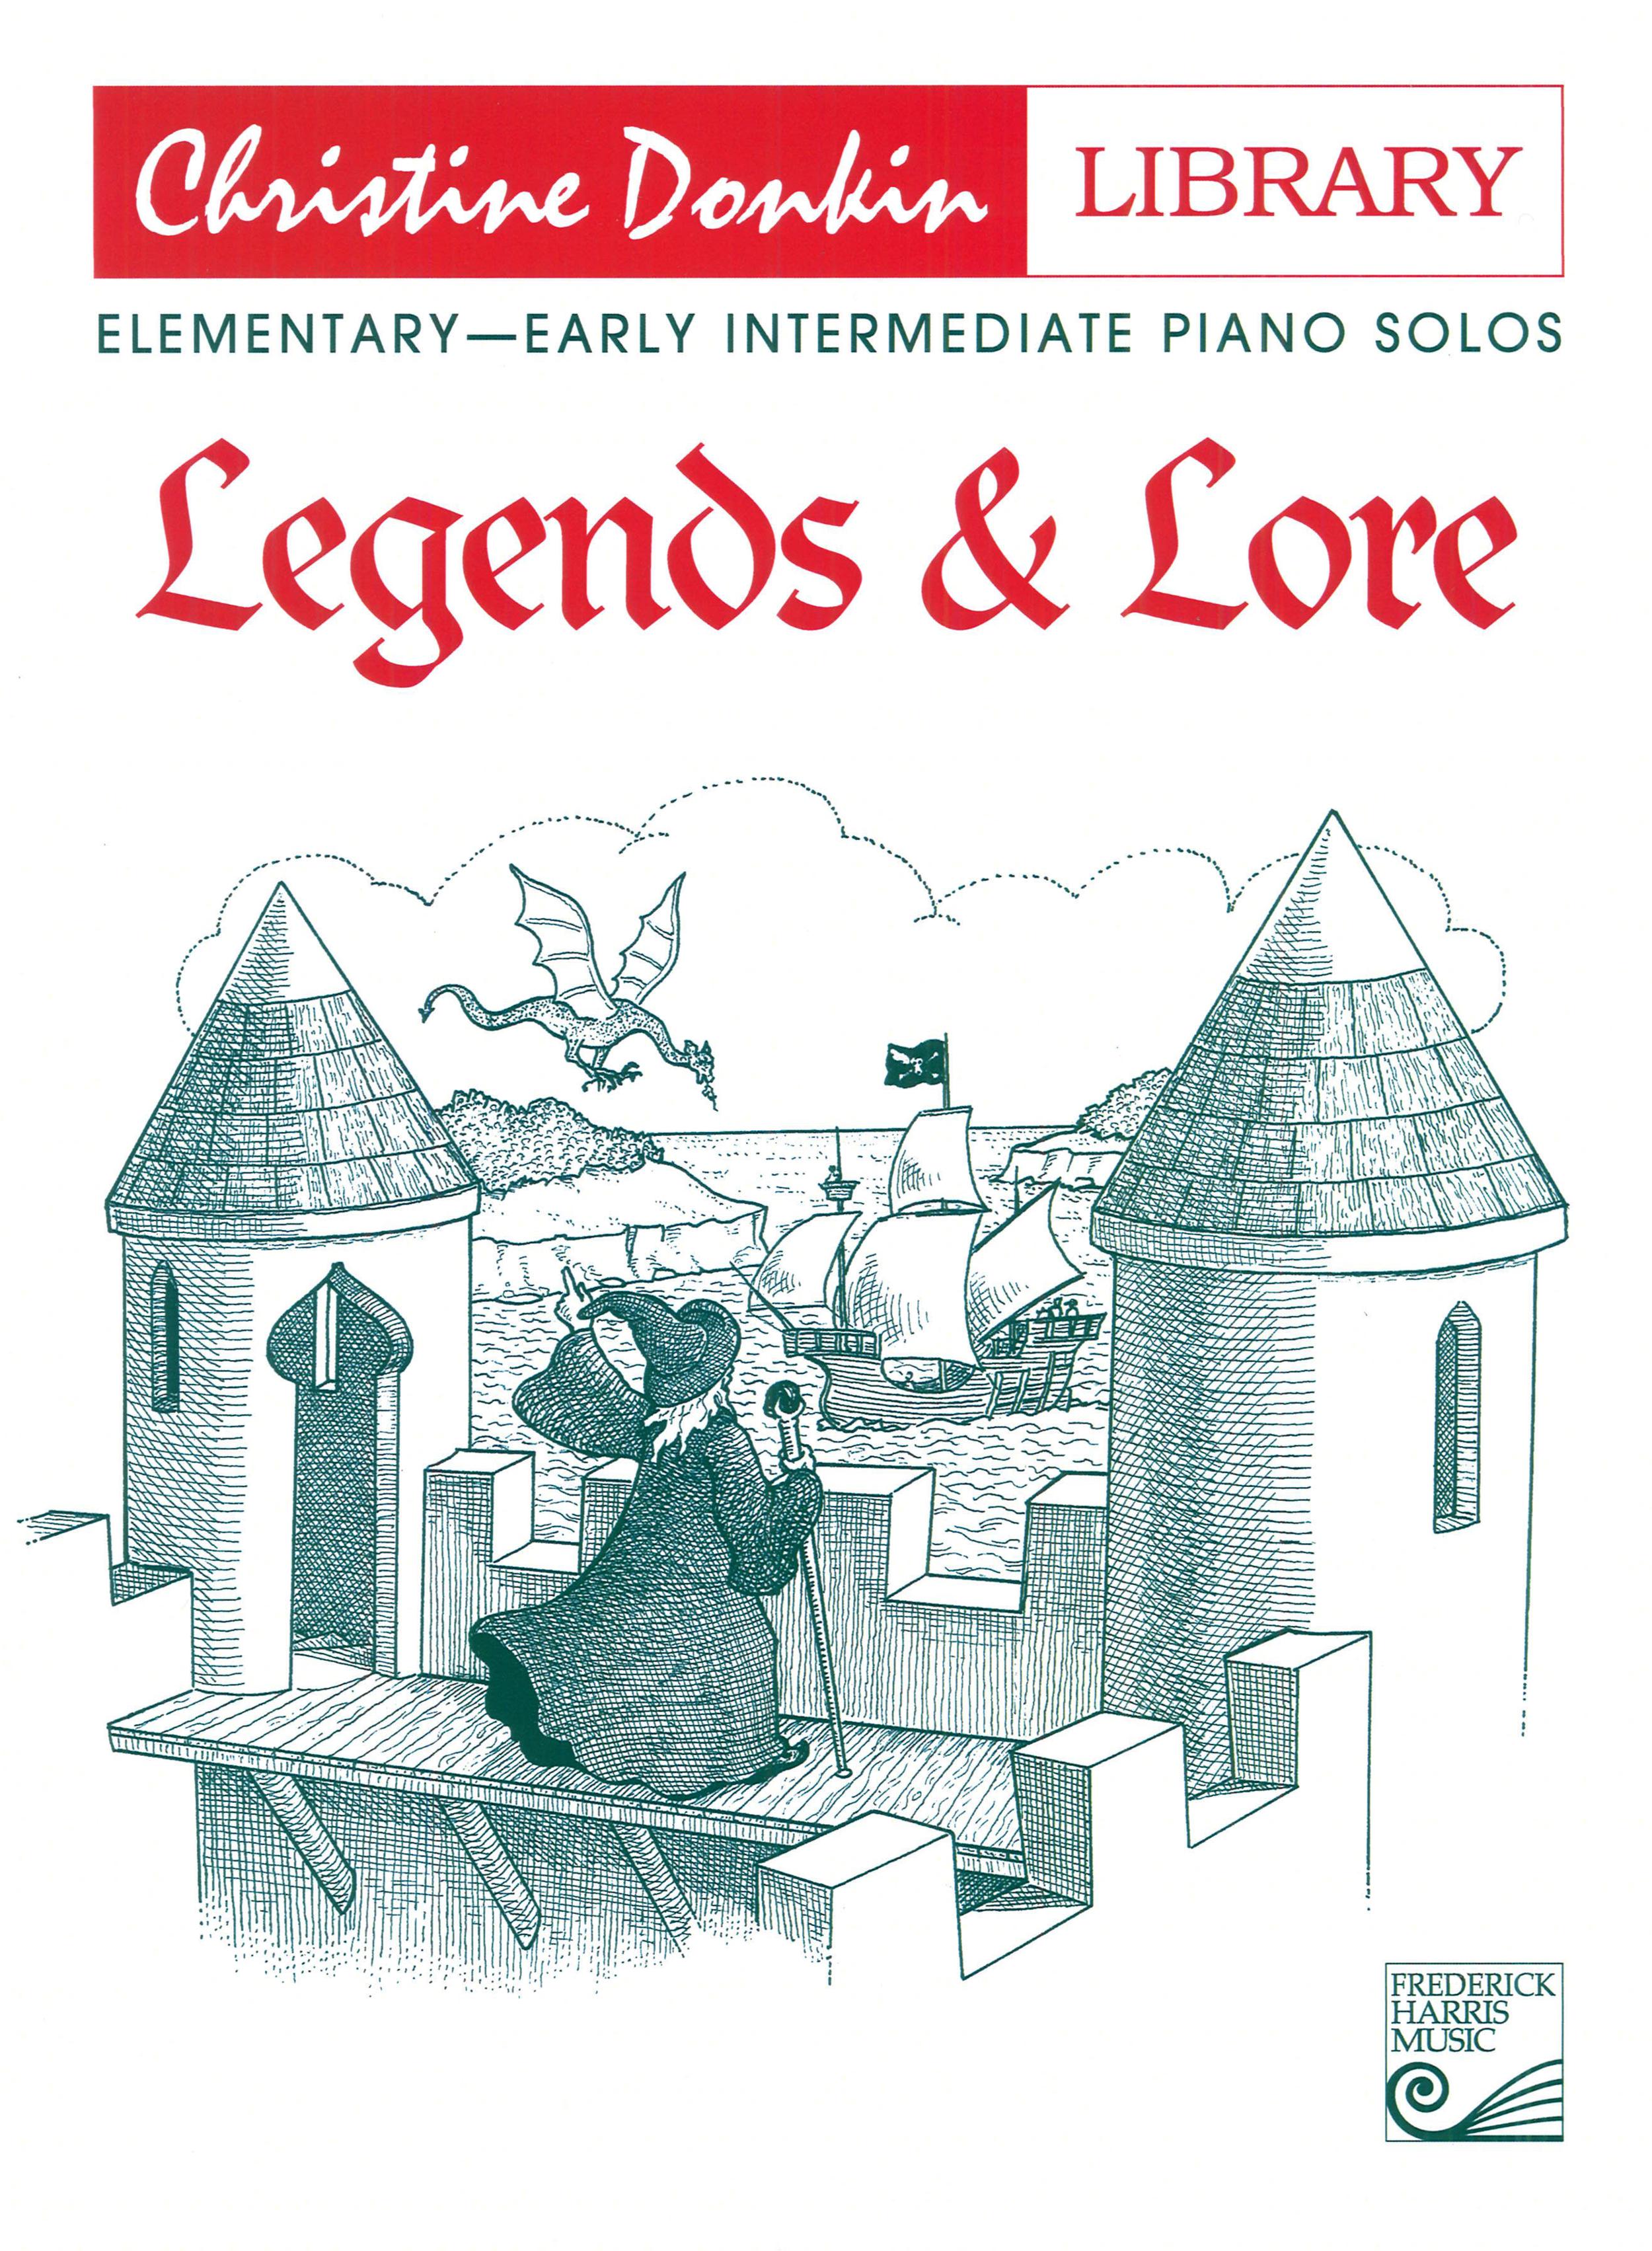 Legends & Lore (elementary piano) — Christine Donkin